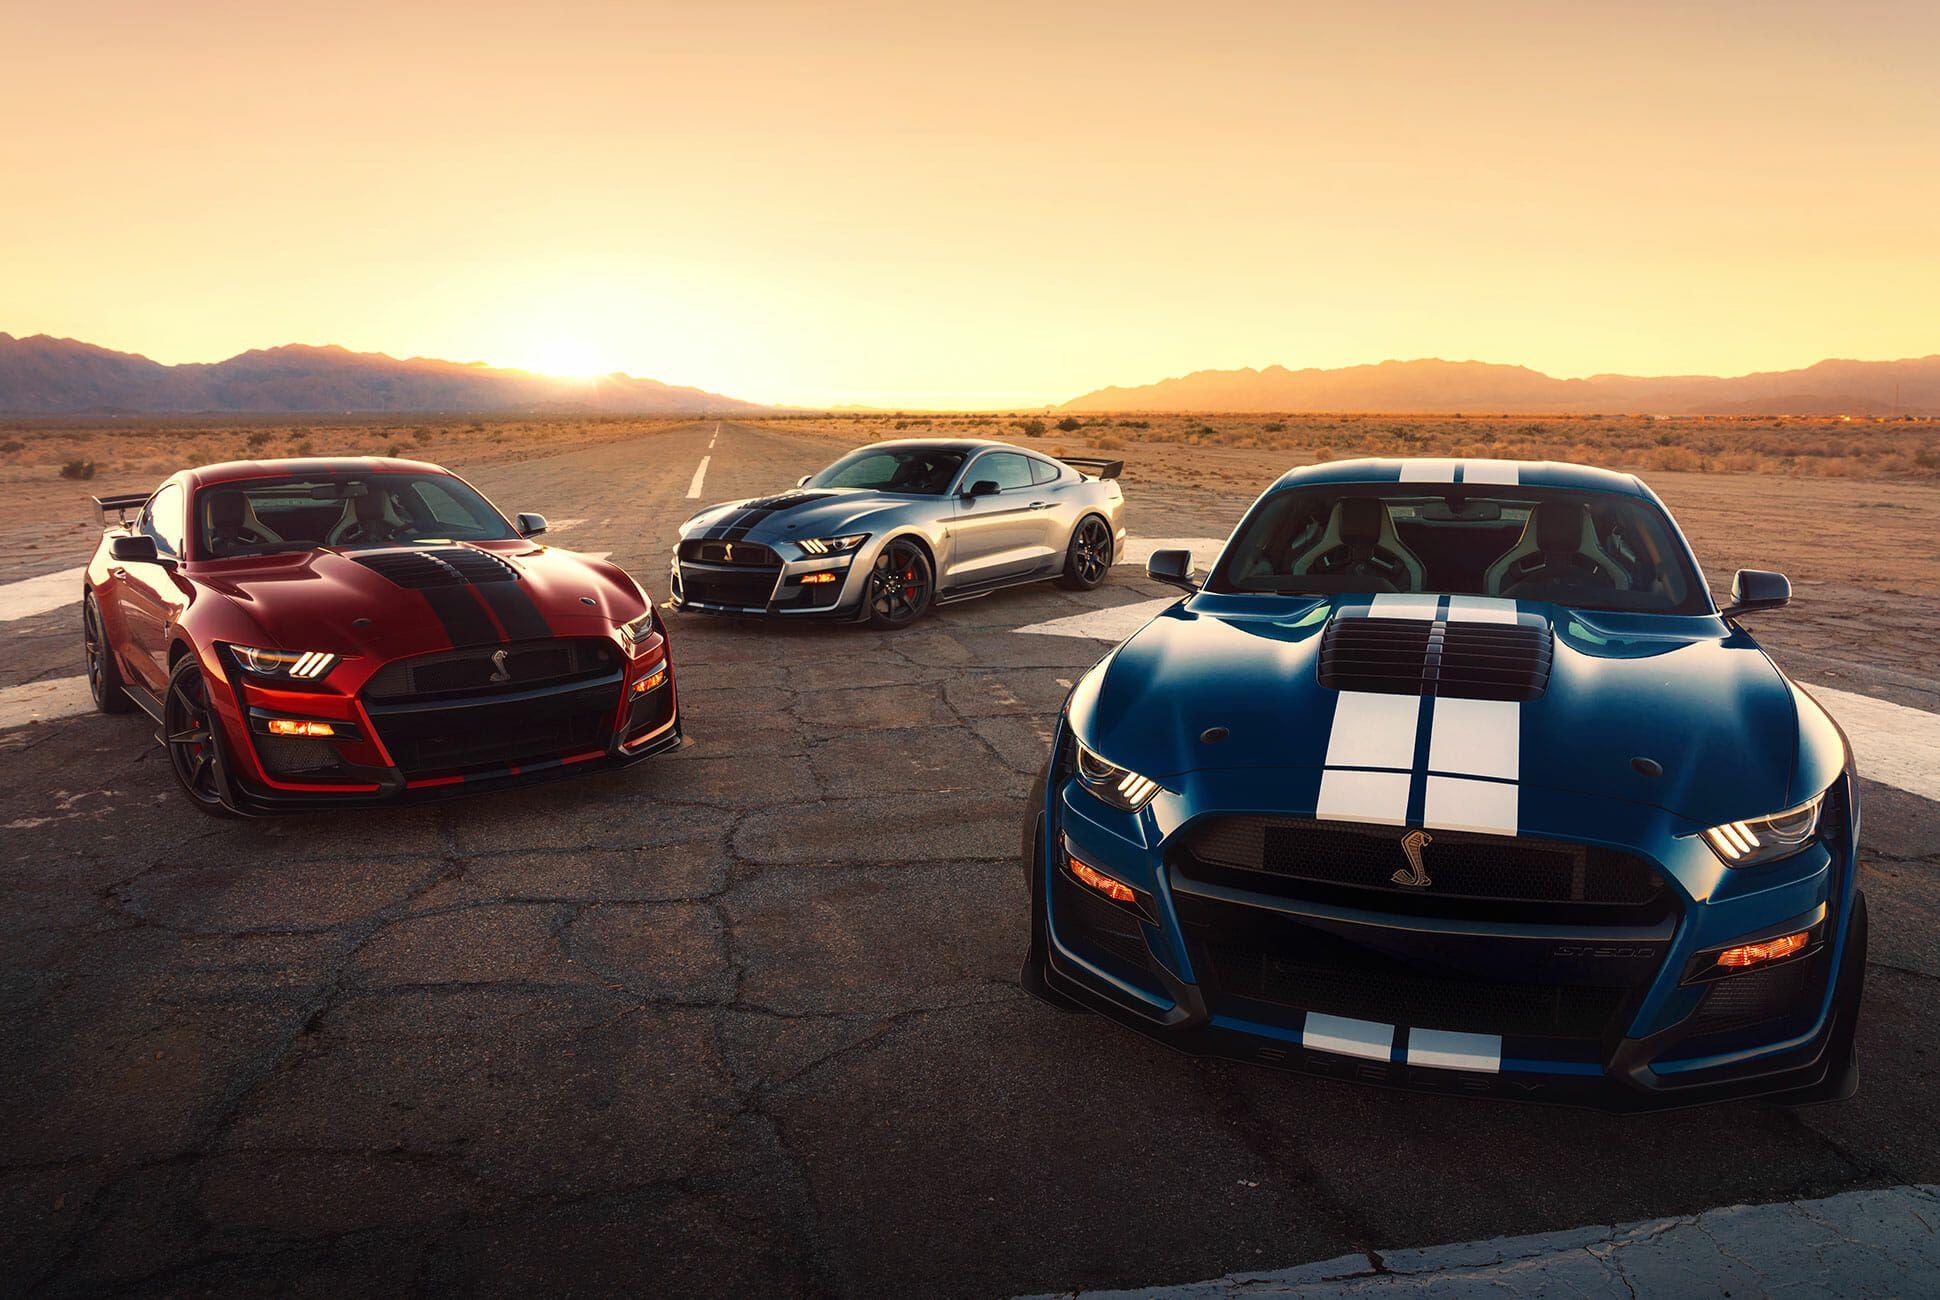 2020-Ford-Mustang-Shelby-GT500-gear-patrol-slide-1